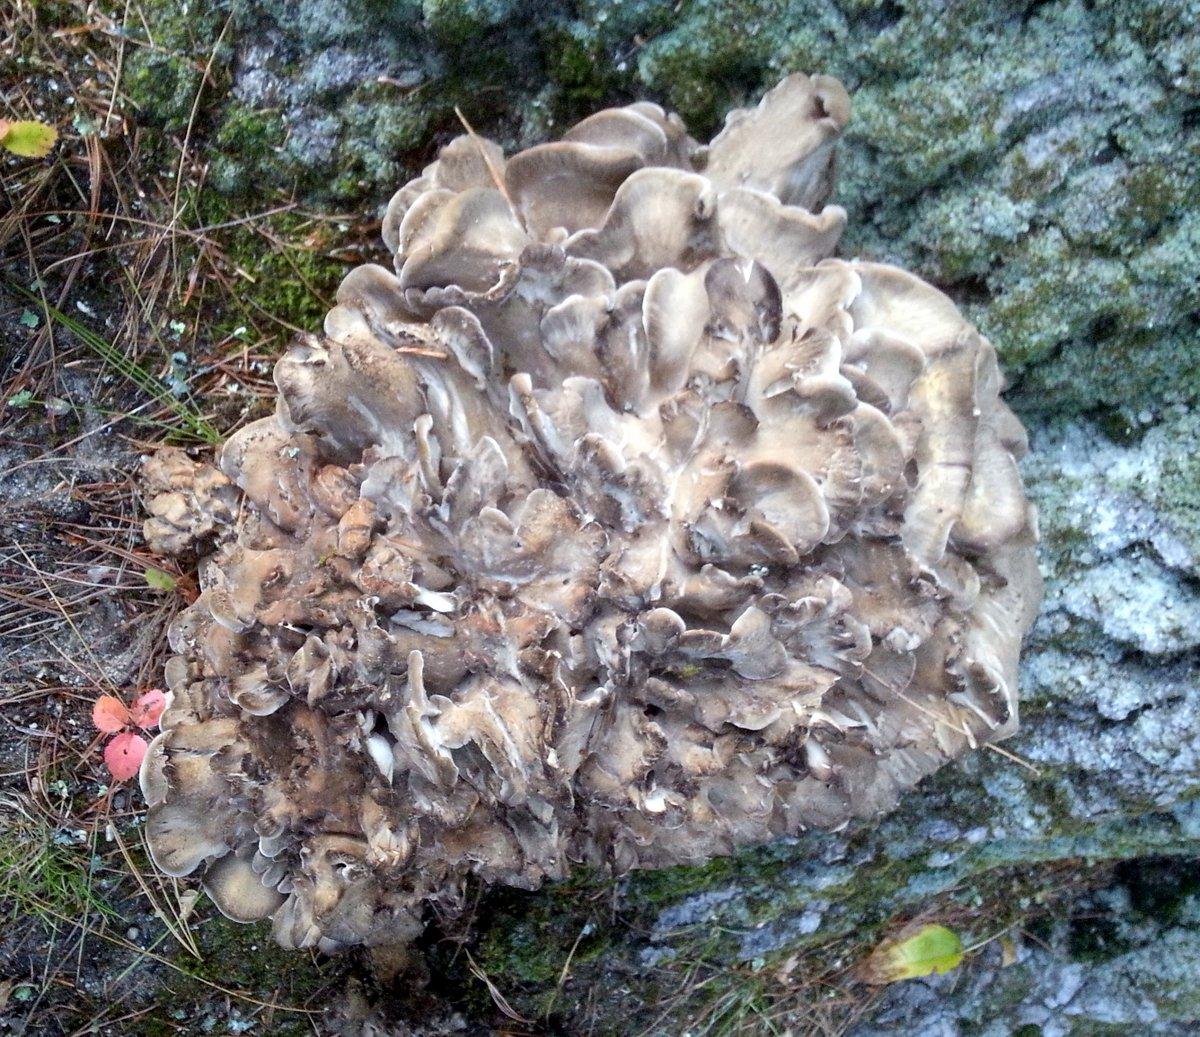 10. Fungus